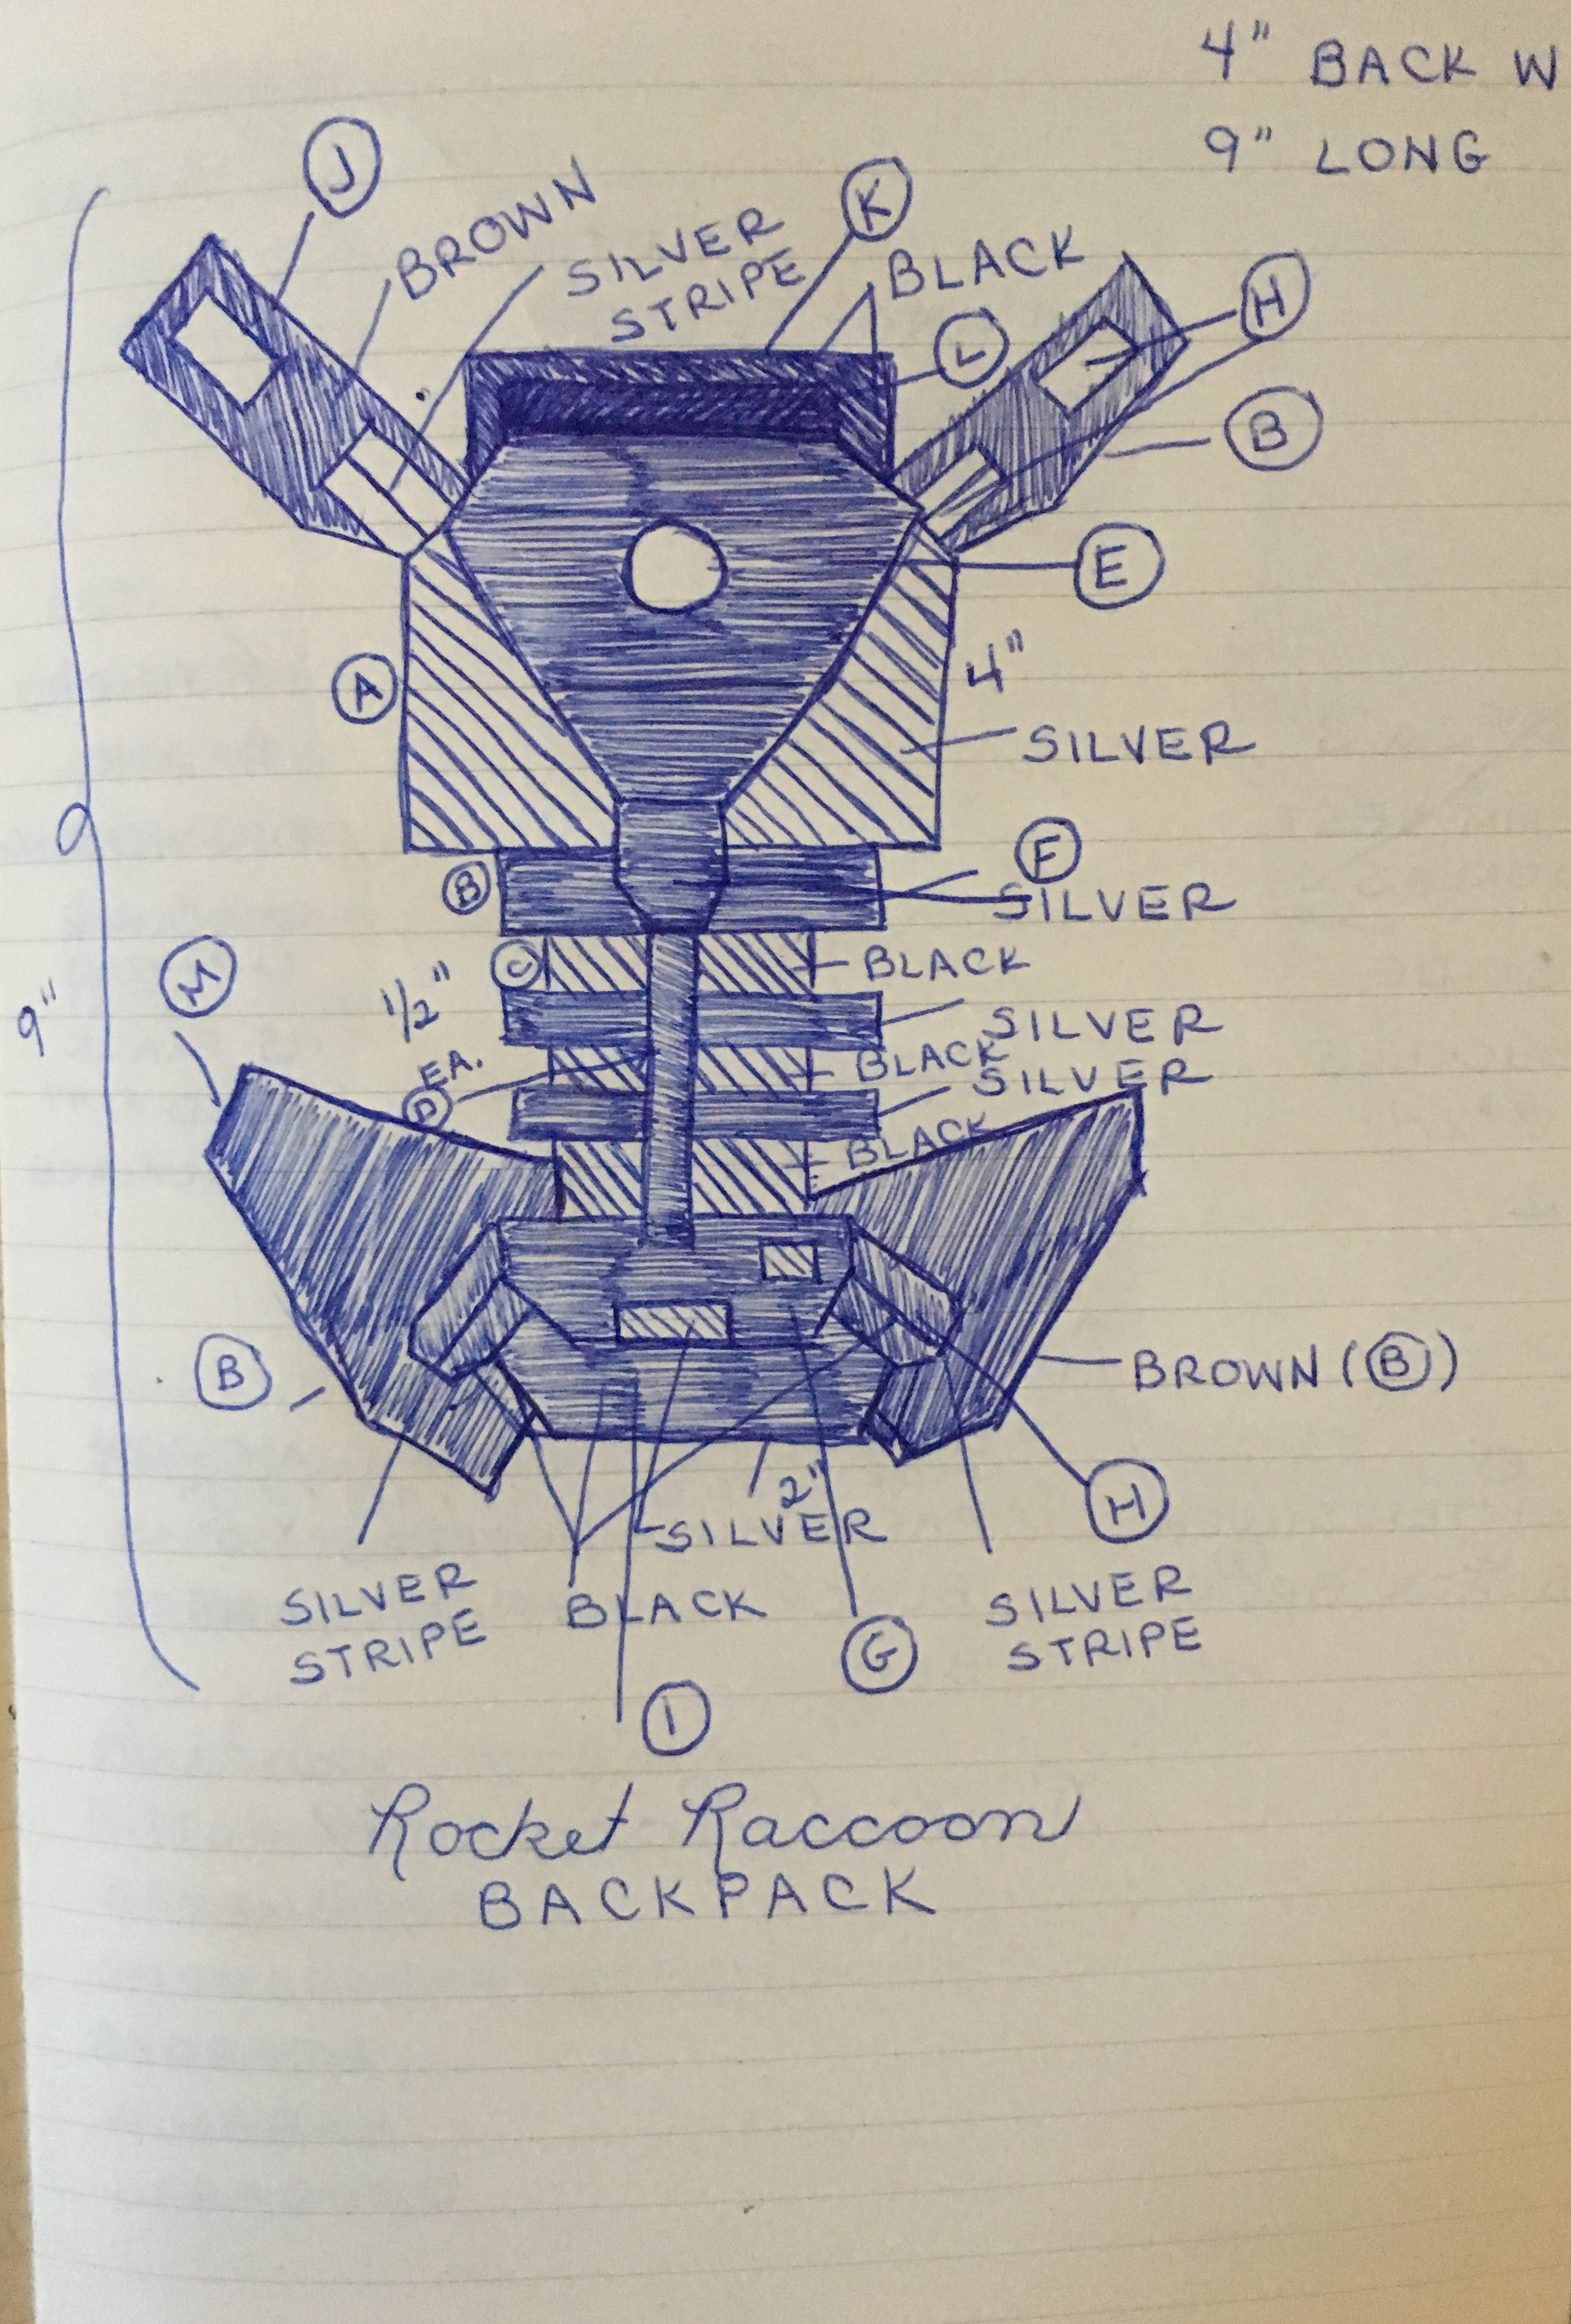 Sketching for my Rocket Raccoon